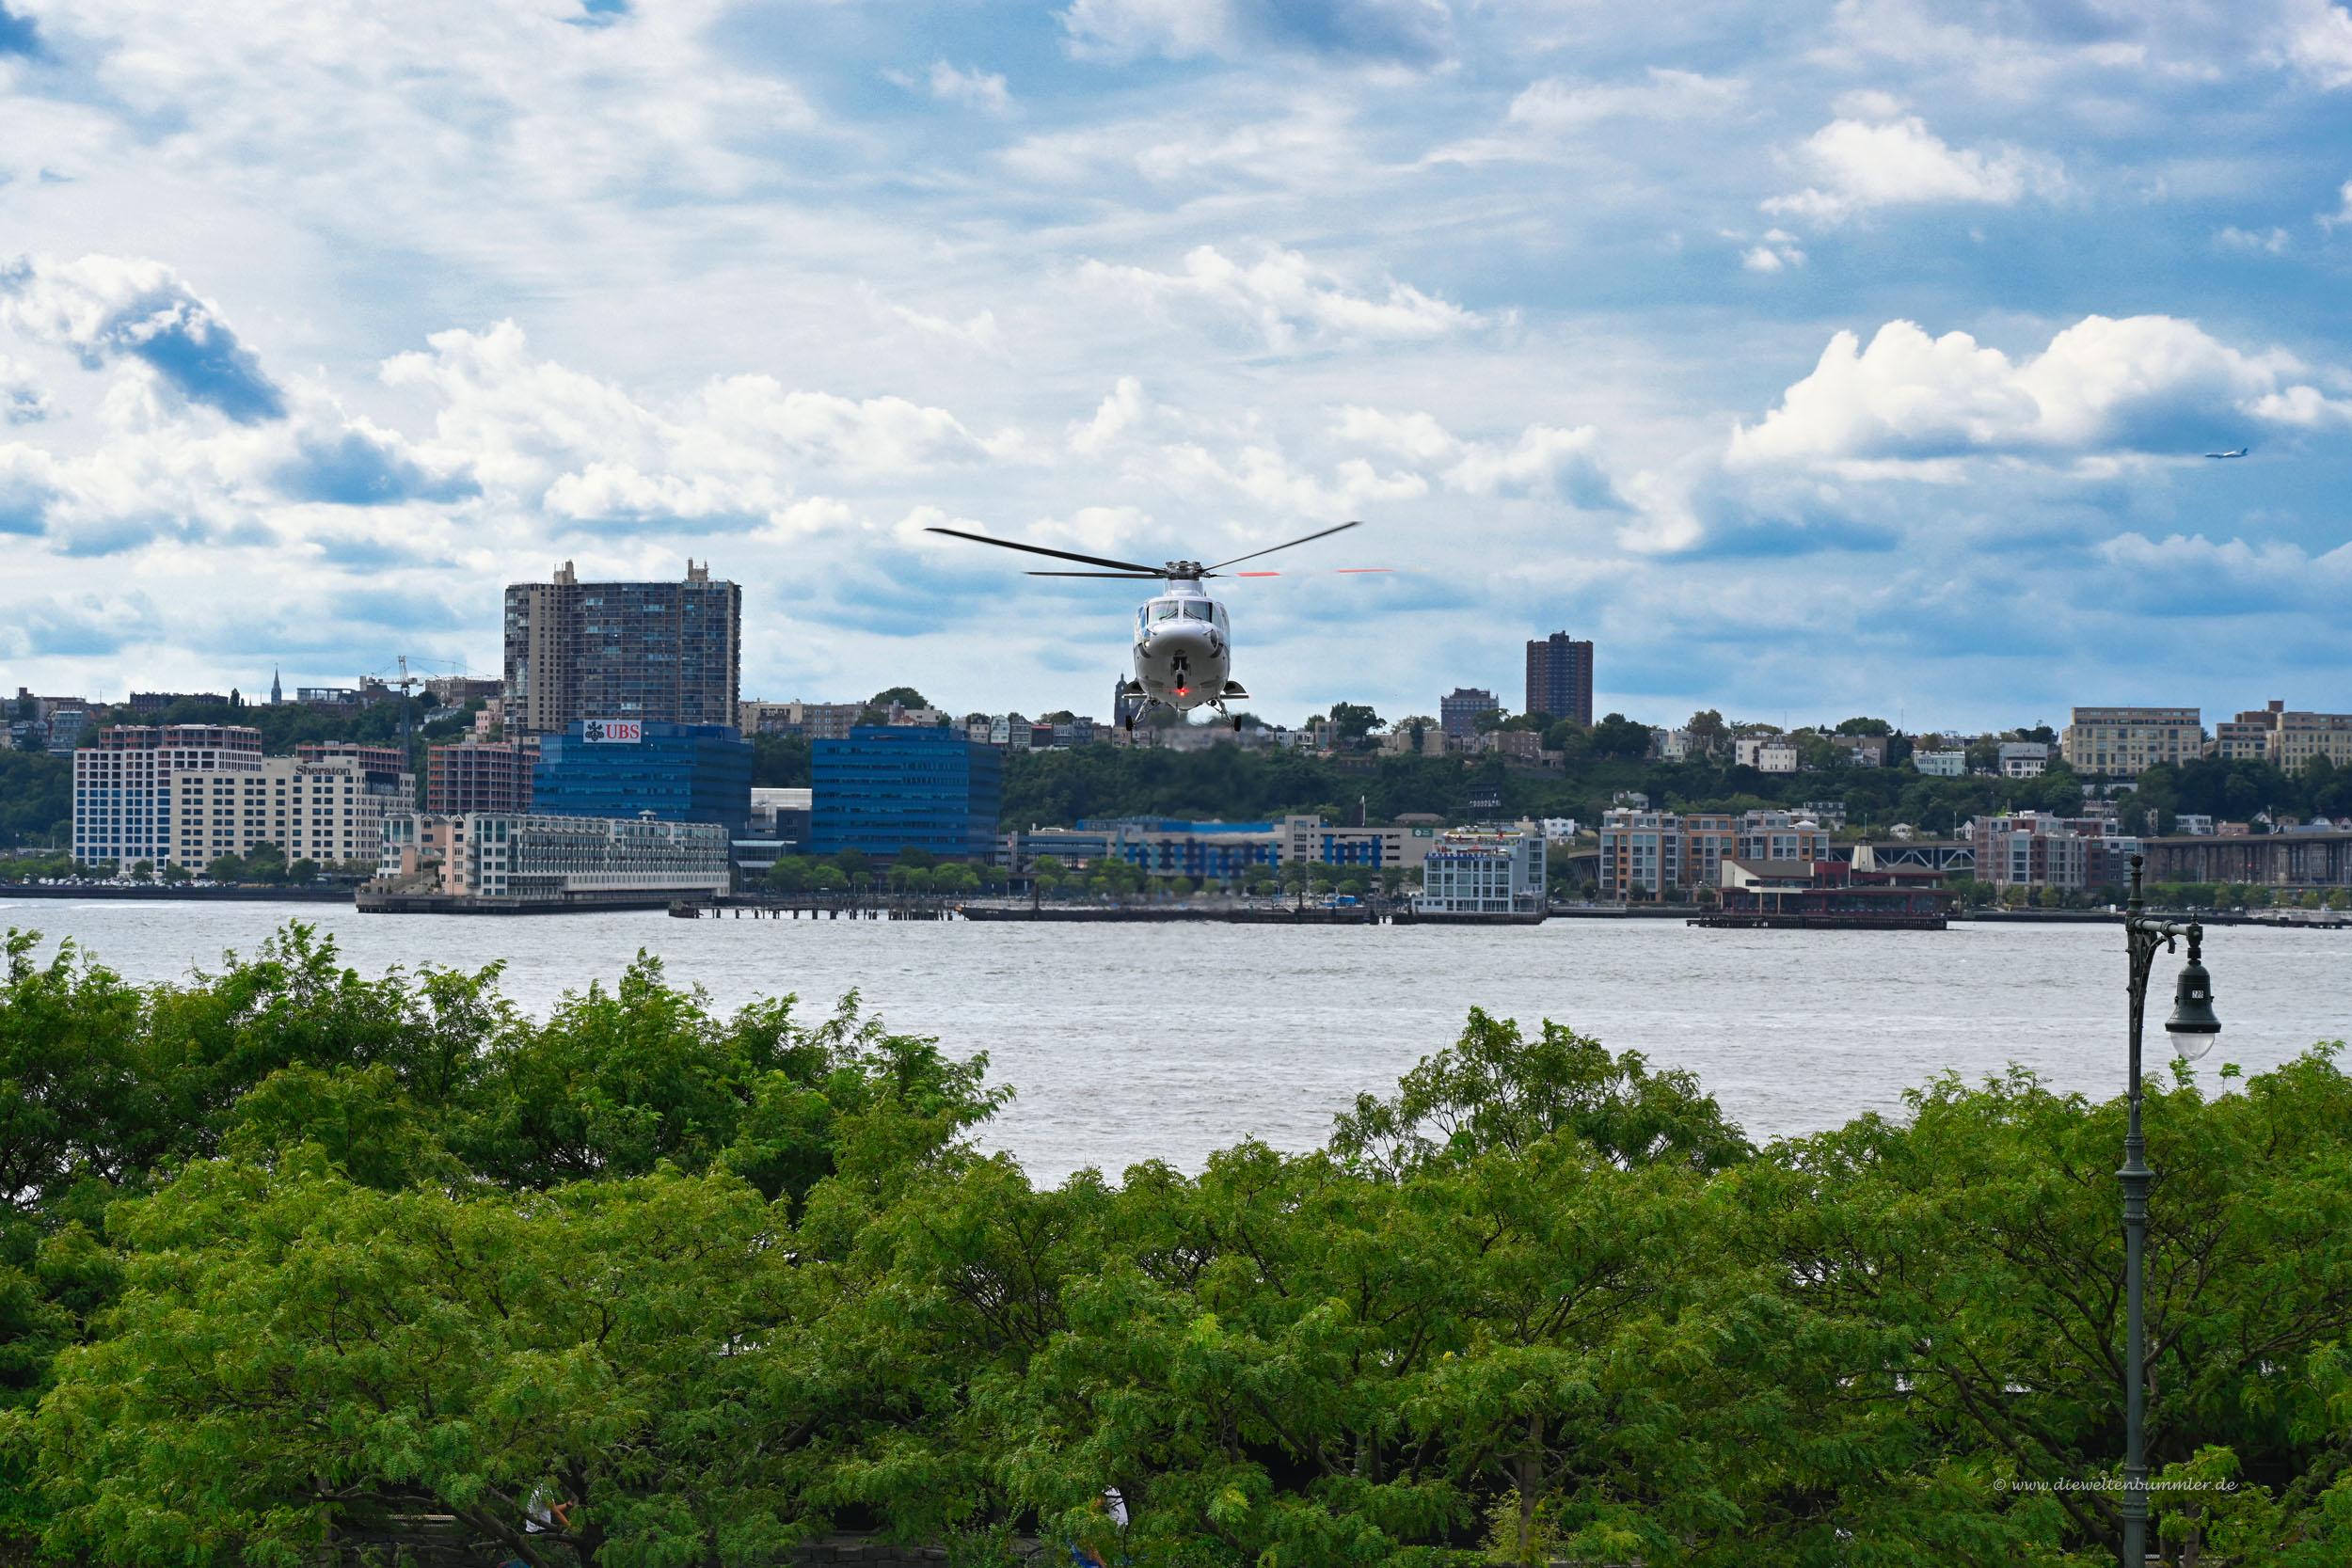 Blick auf den Hudson River